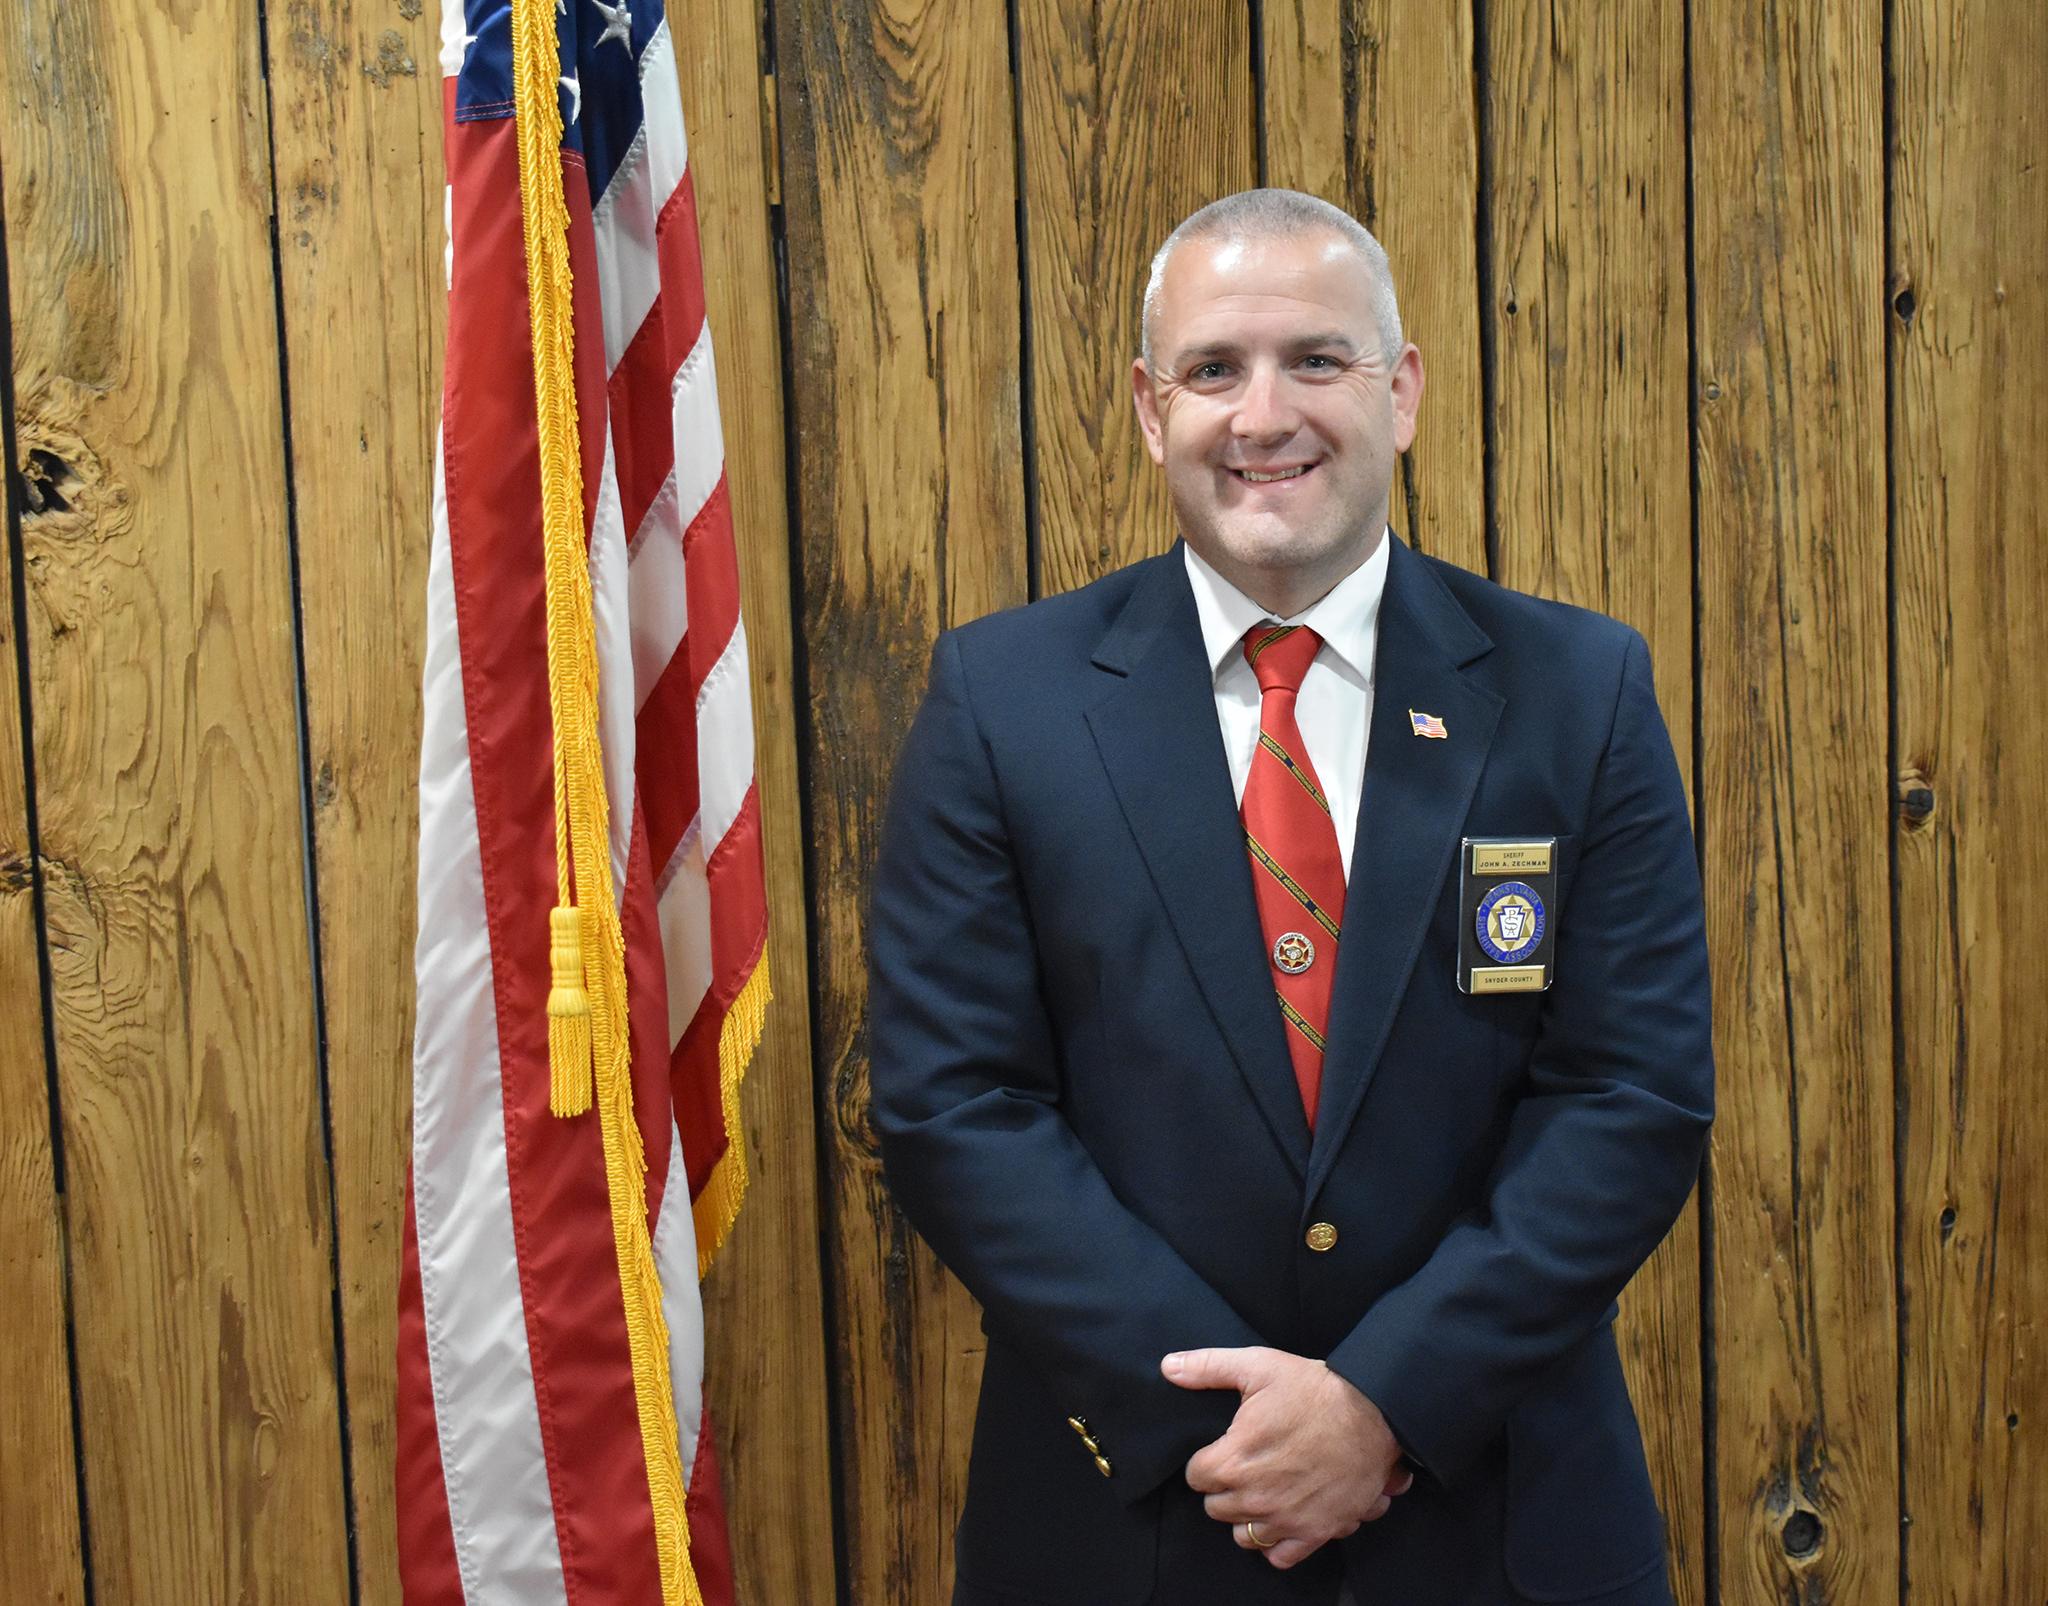 Sheriff John Zechman